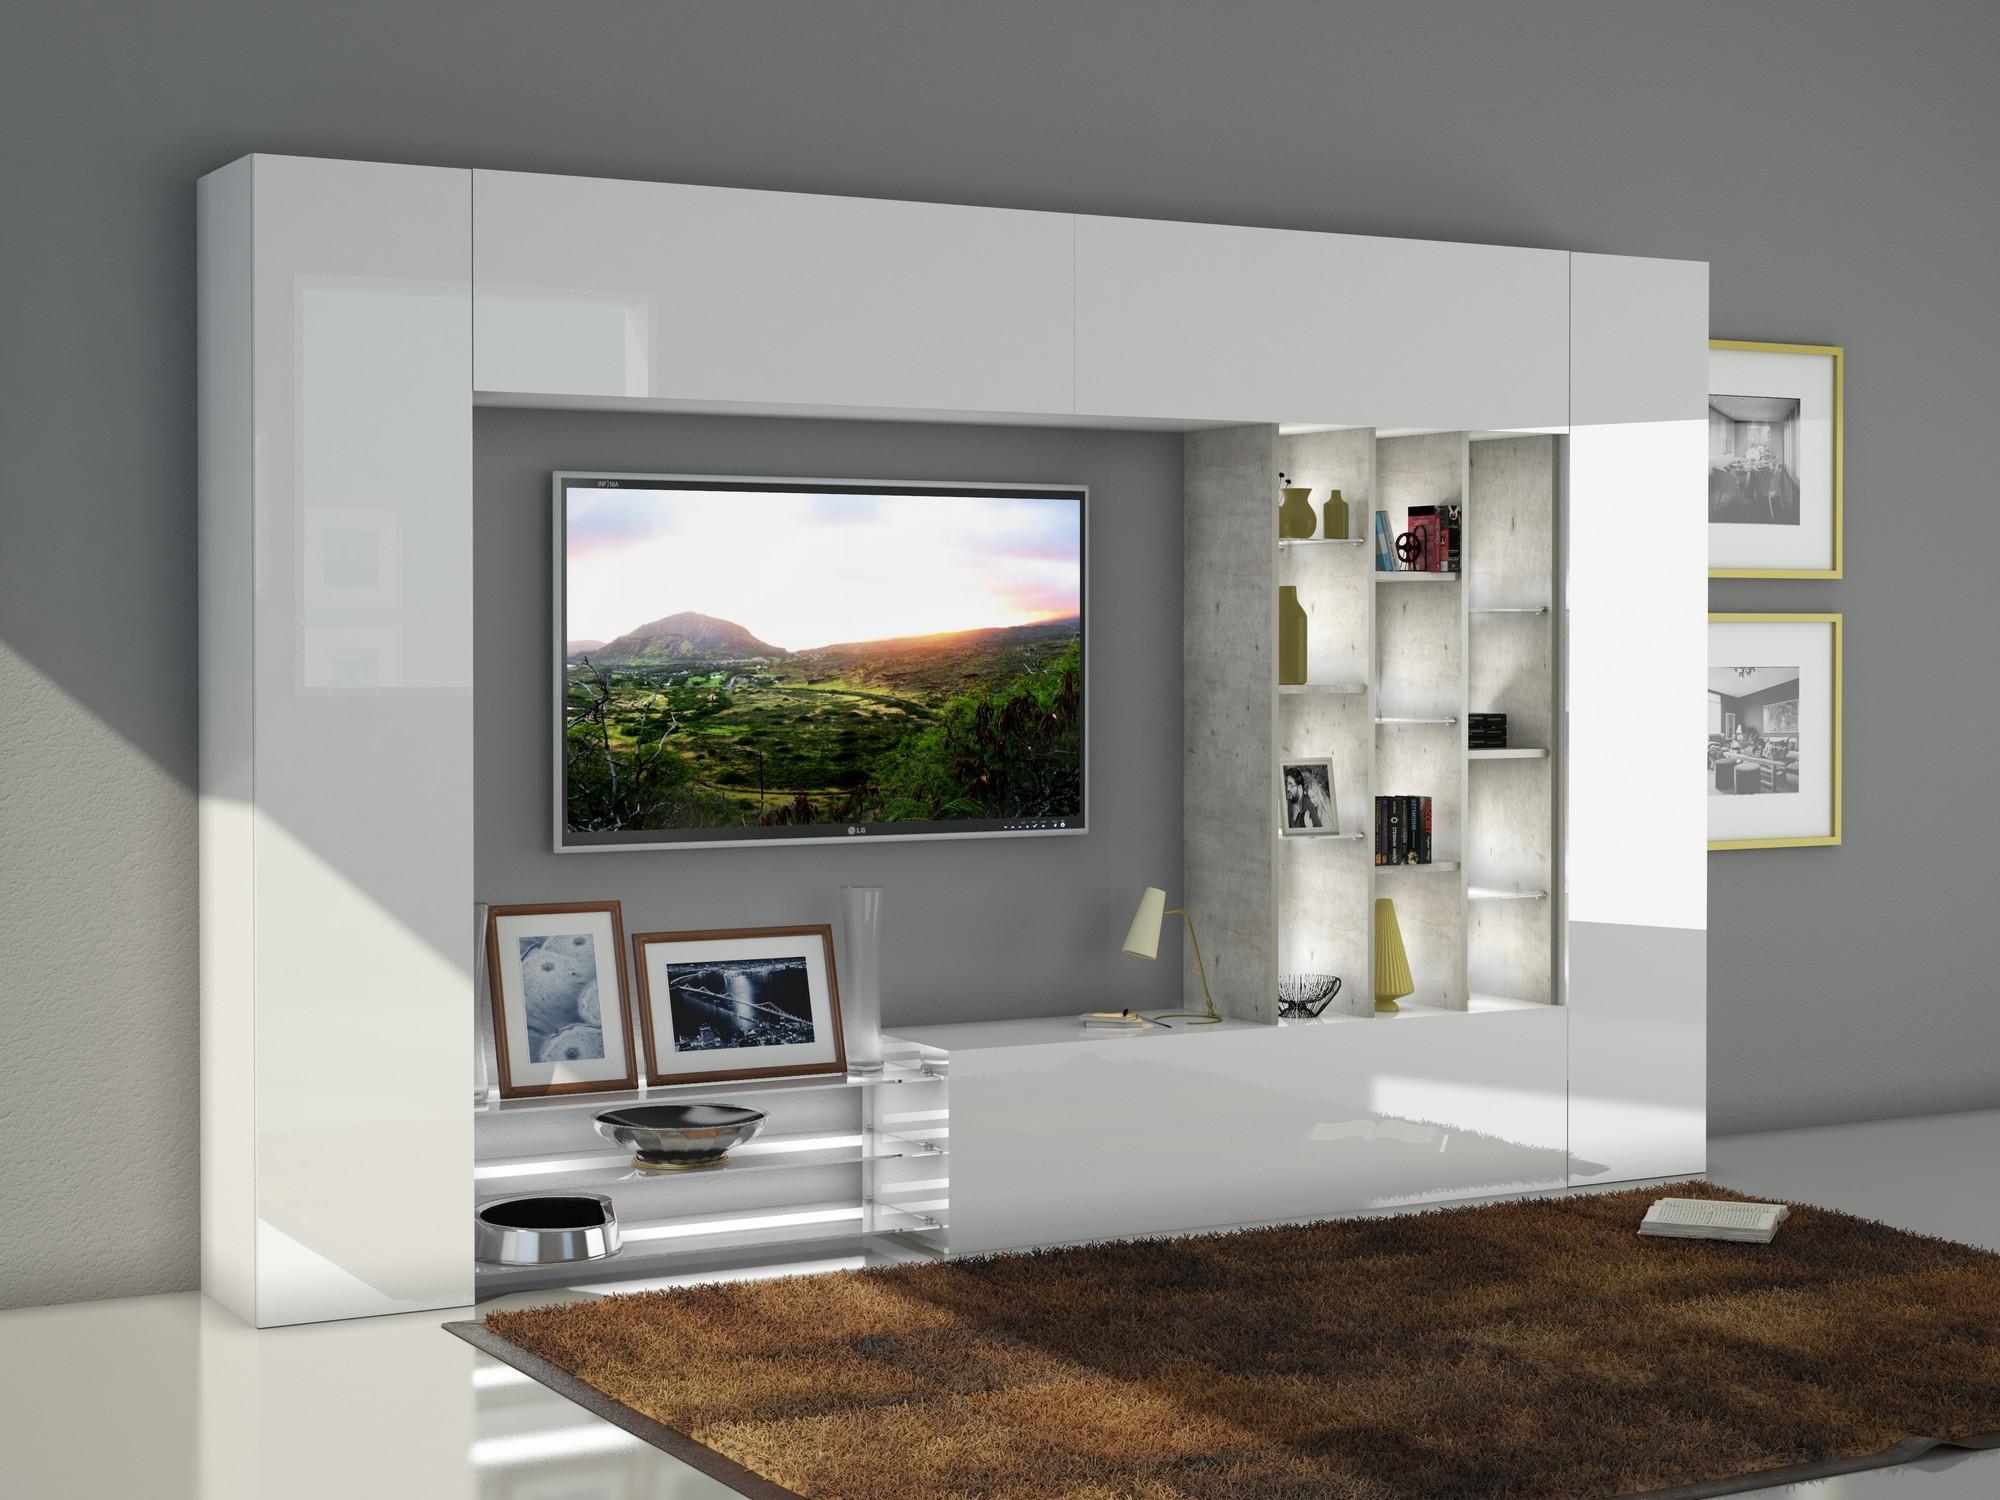 386031 - Wall Unit - Tecnos Italy